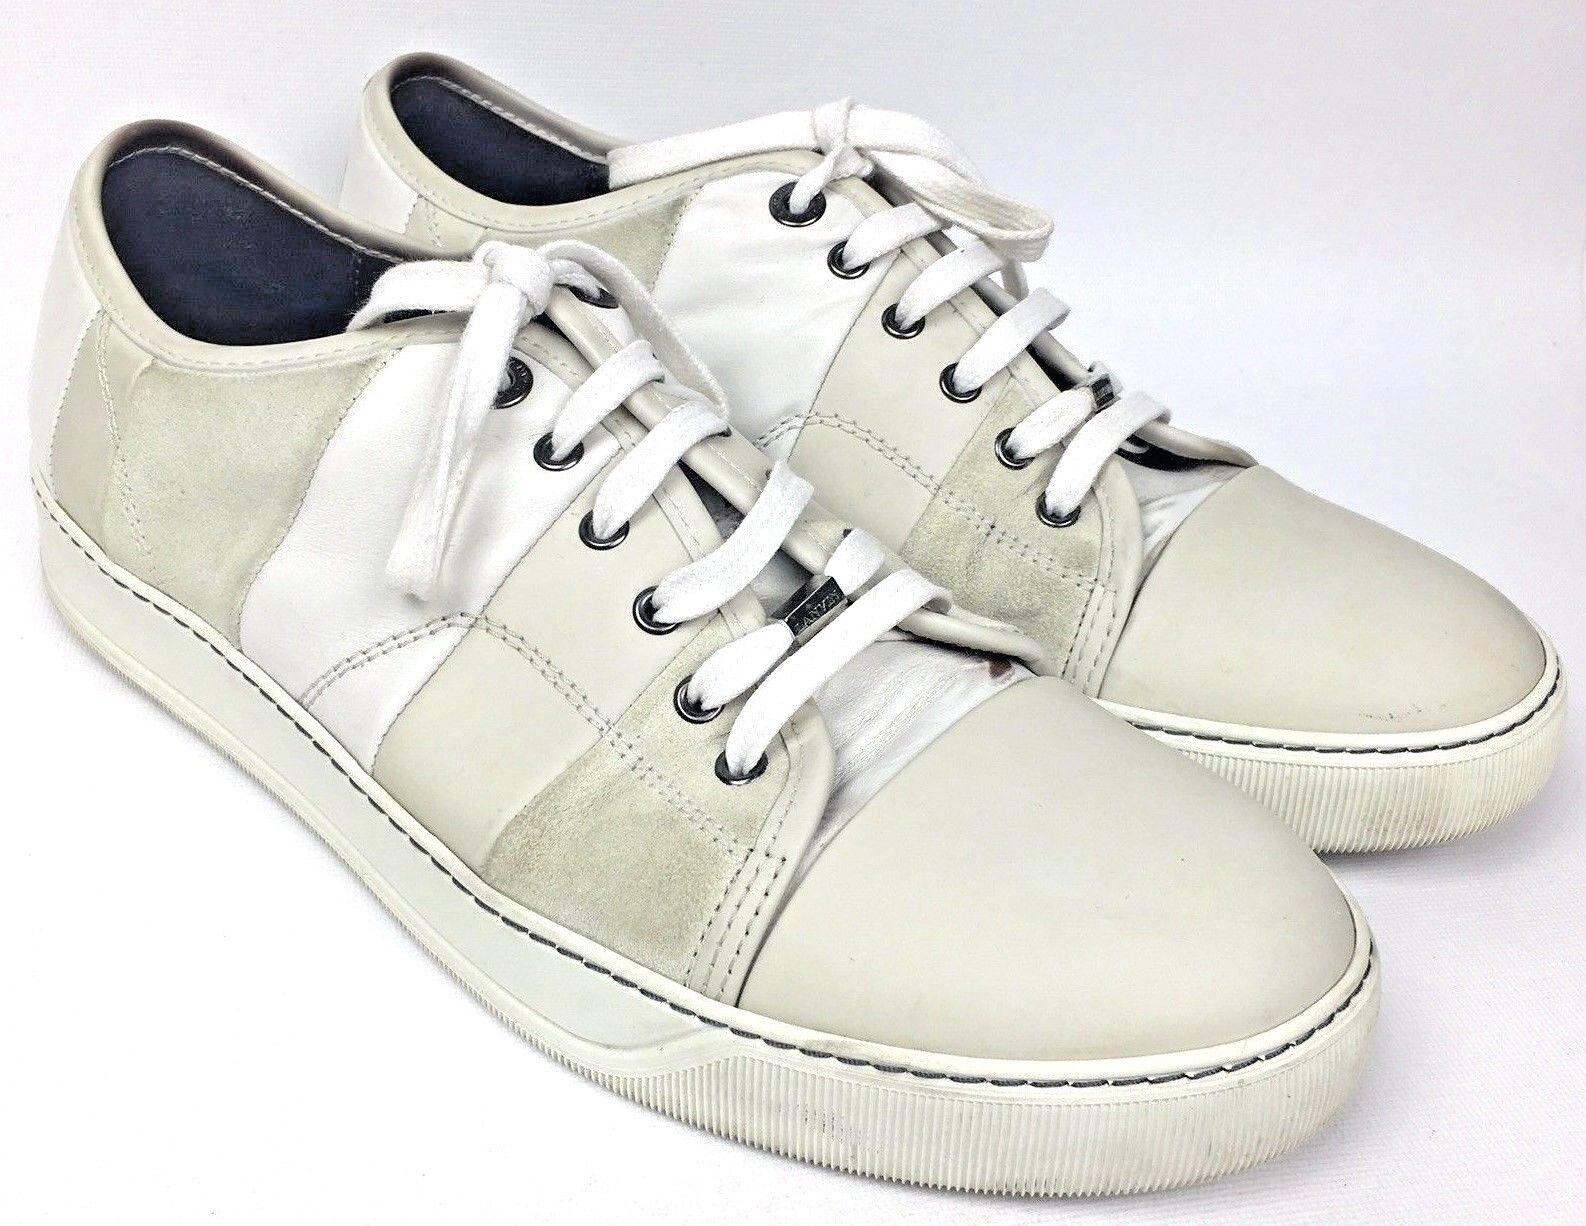 LANVIN Lacets Homme Cuir Daim Baskets Chaussures Taille UK 10 US 11